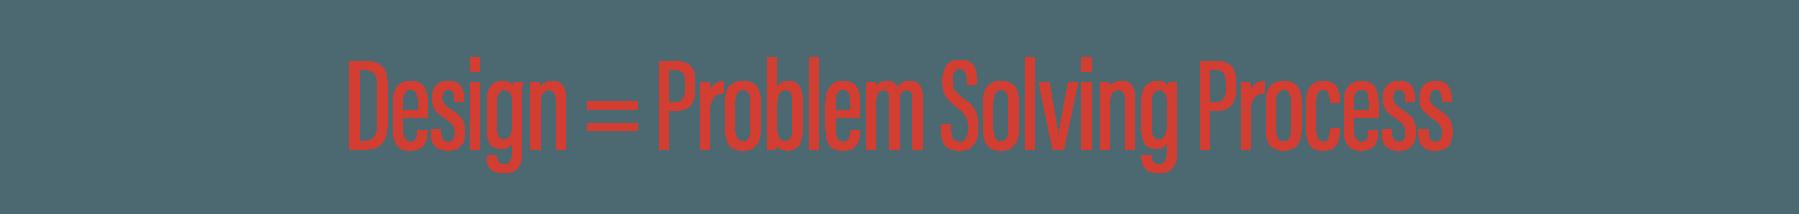 Design = Problem Solving Process